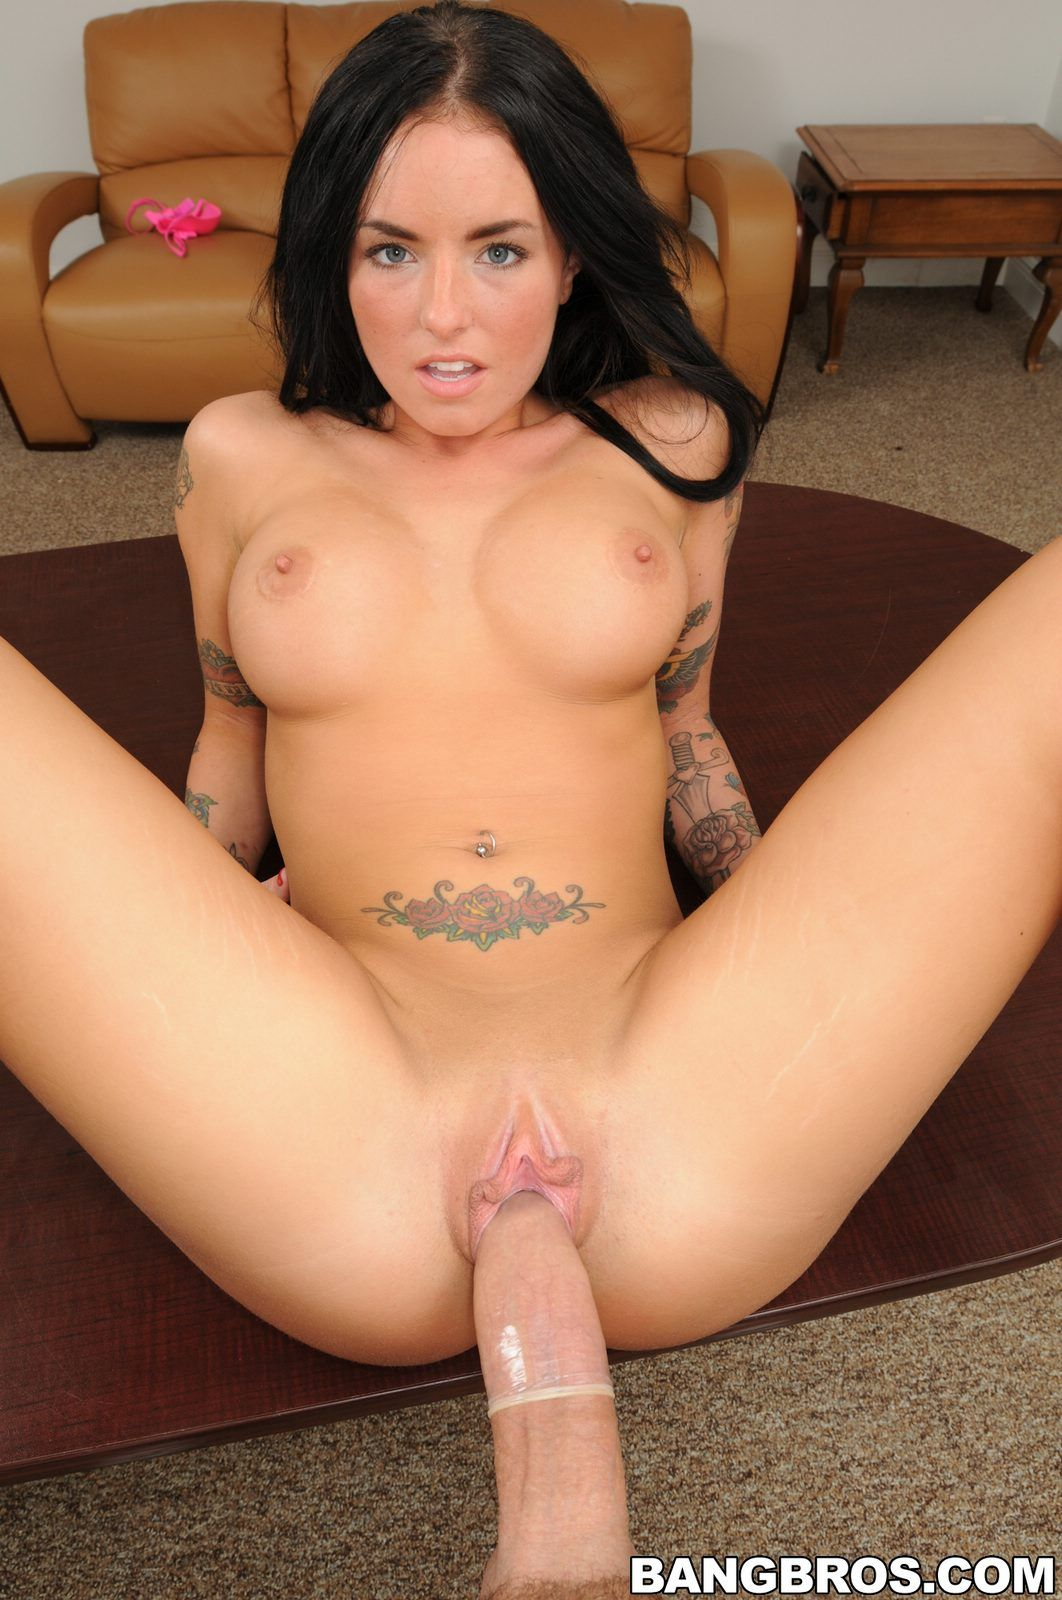 Arioa Perez Porno kendra perez nude photos . porn pic.